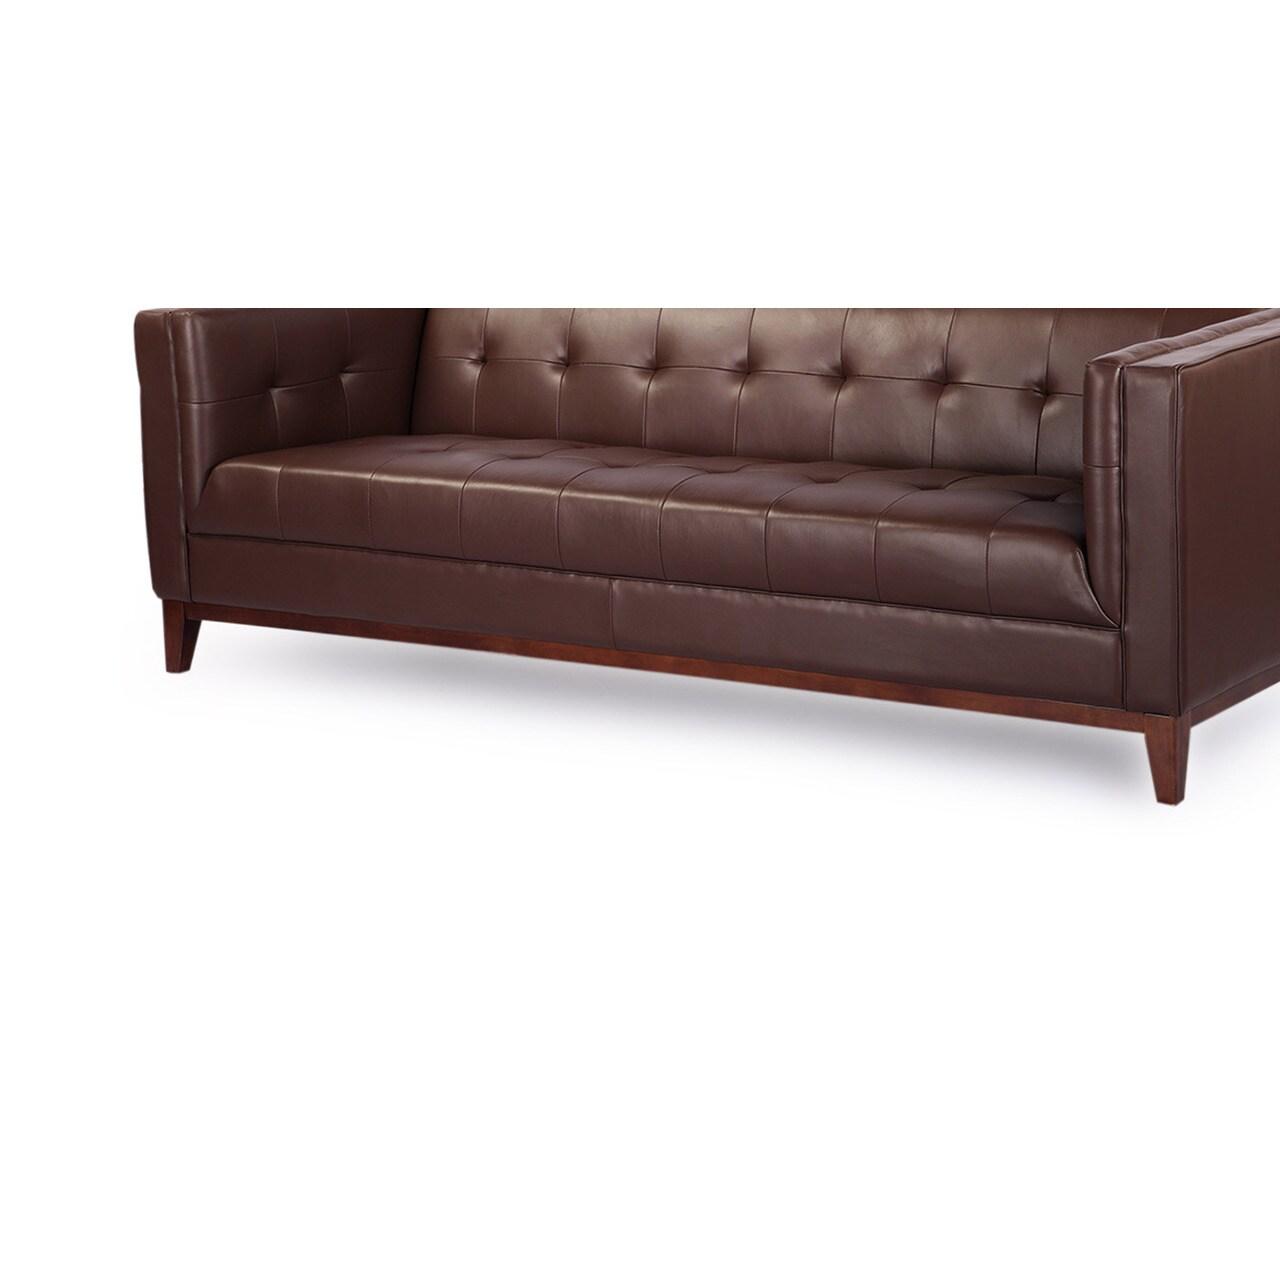 Copper Grove Kinglake Mid Century Modern Loft Sofa Premium Aniline Leather Free Shipping Today 12815883